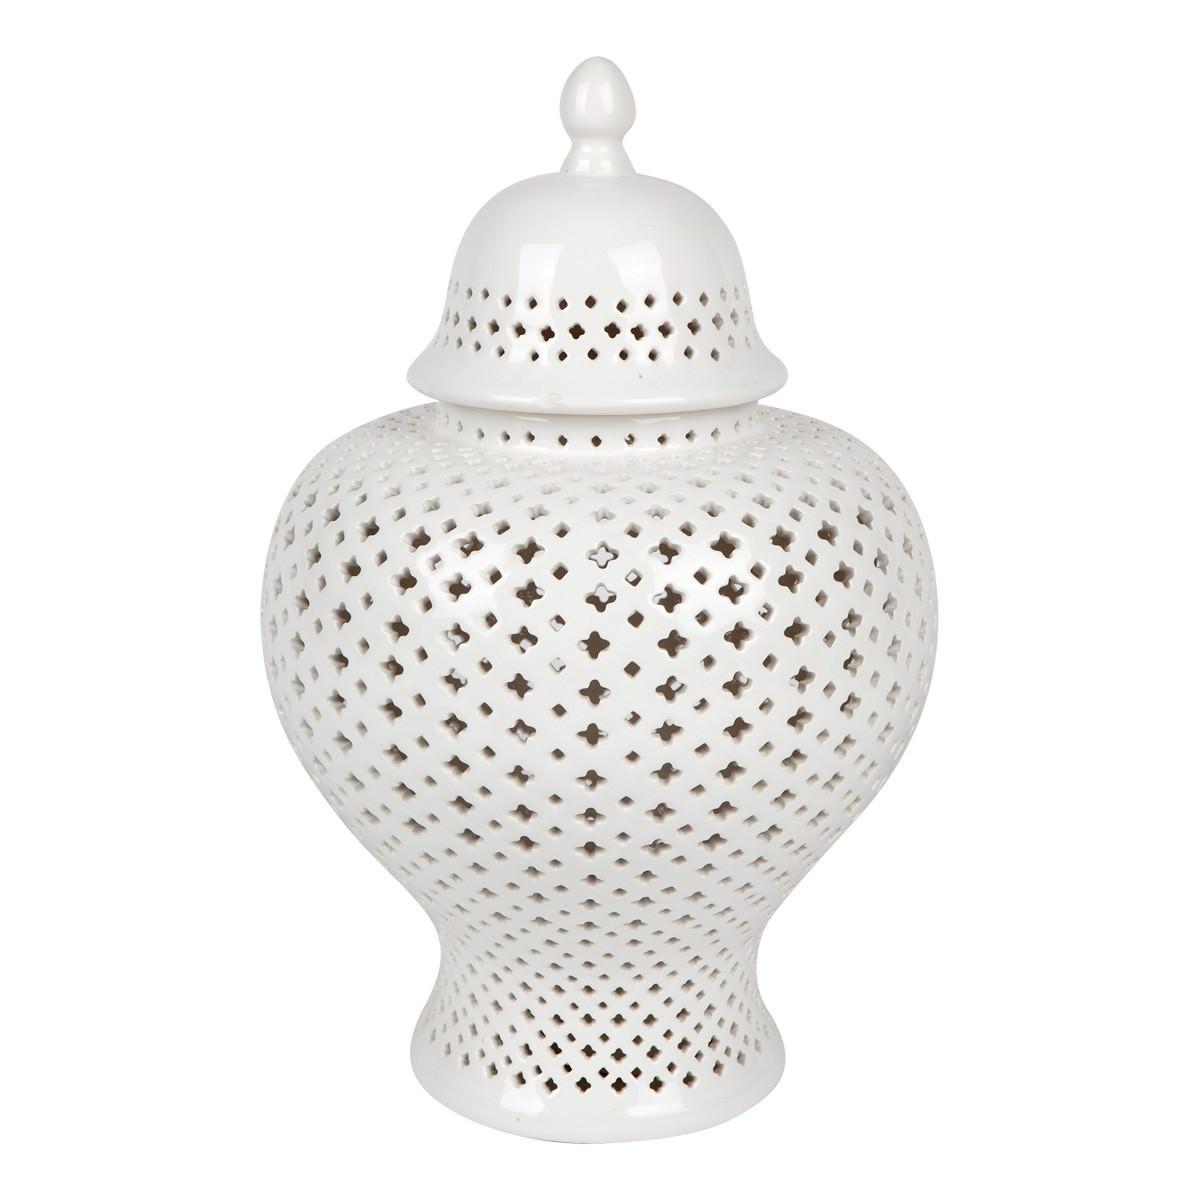 Minx Porcelain Temple Jar, Medium, White